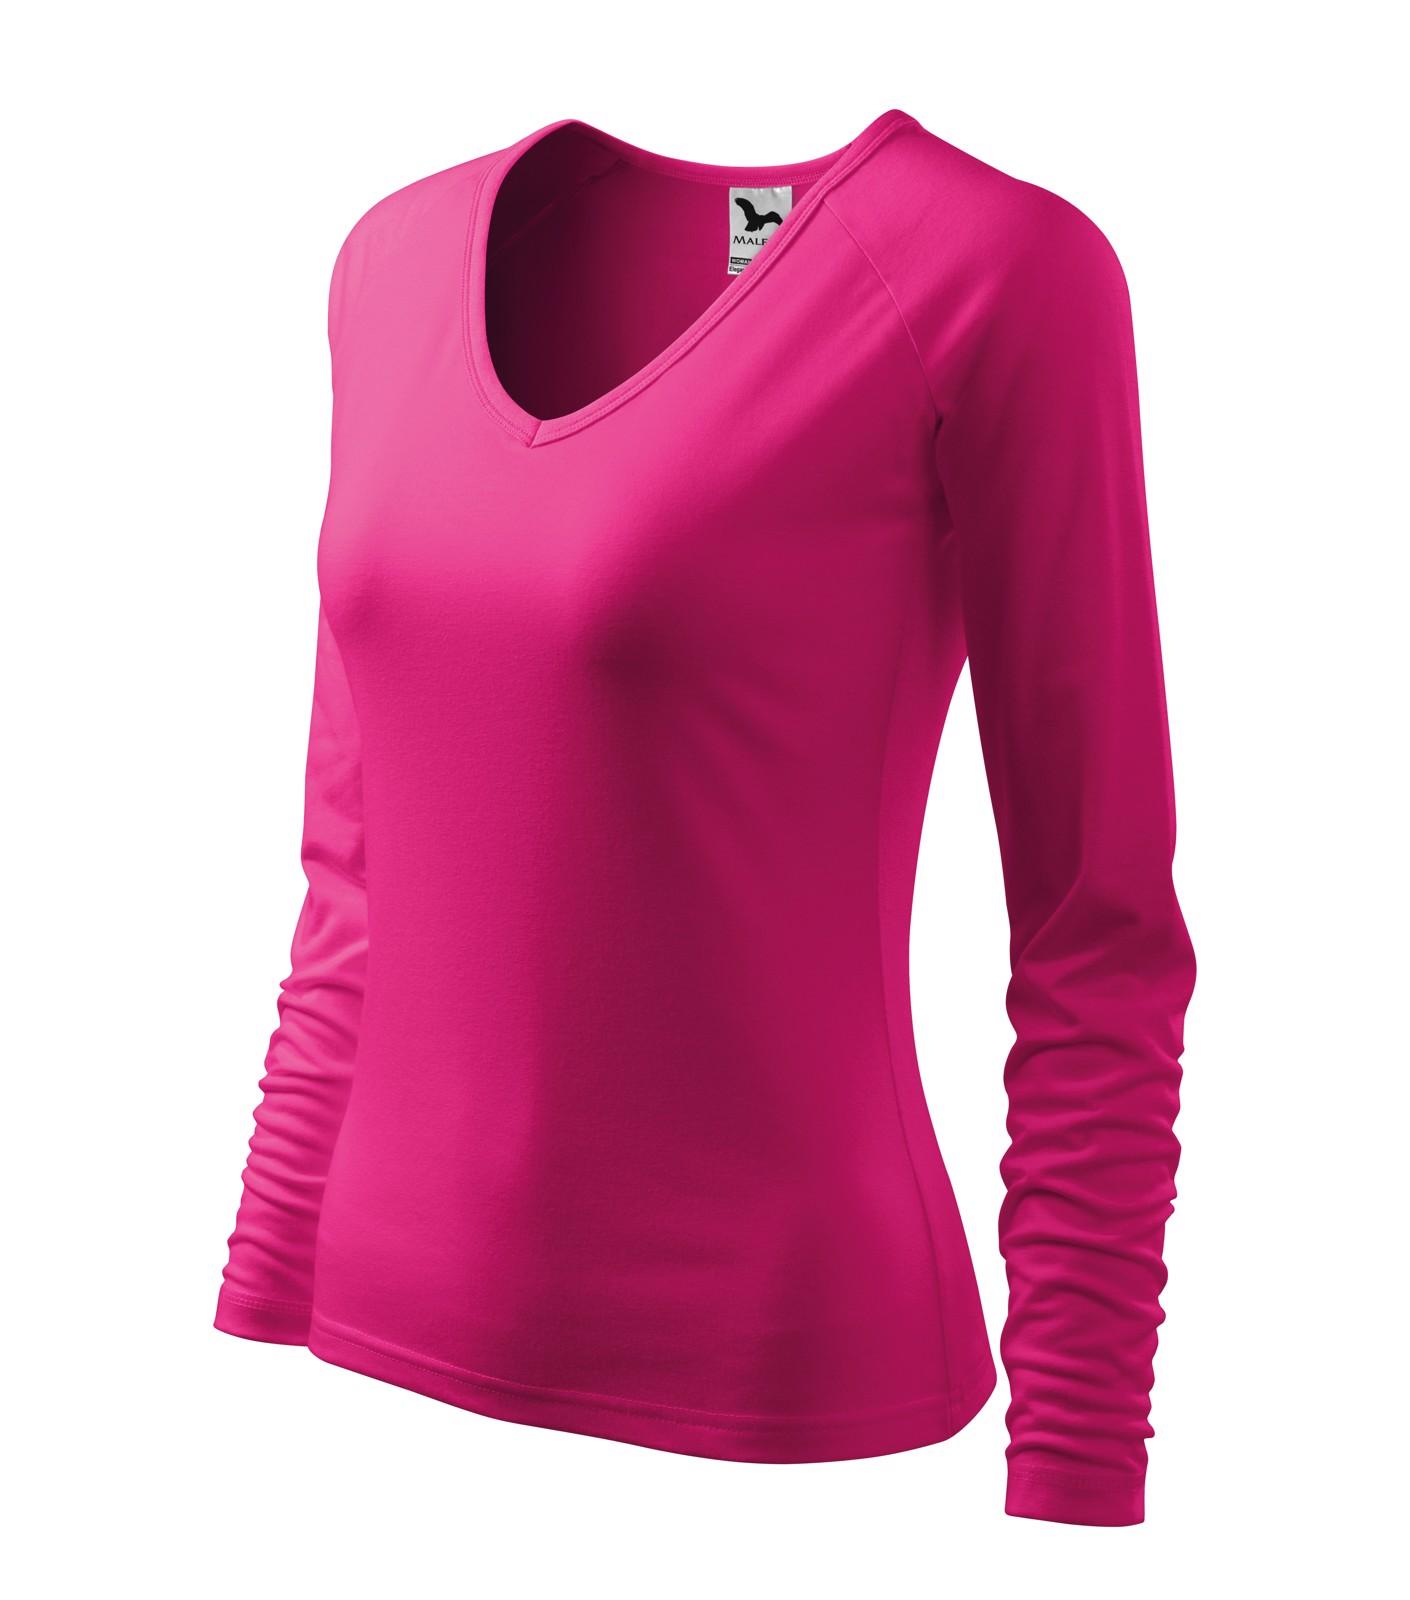 T-shirt women's Malfini Elegance - Raspberry Pink / 2XL